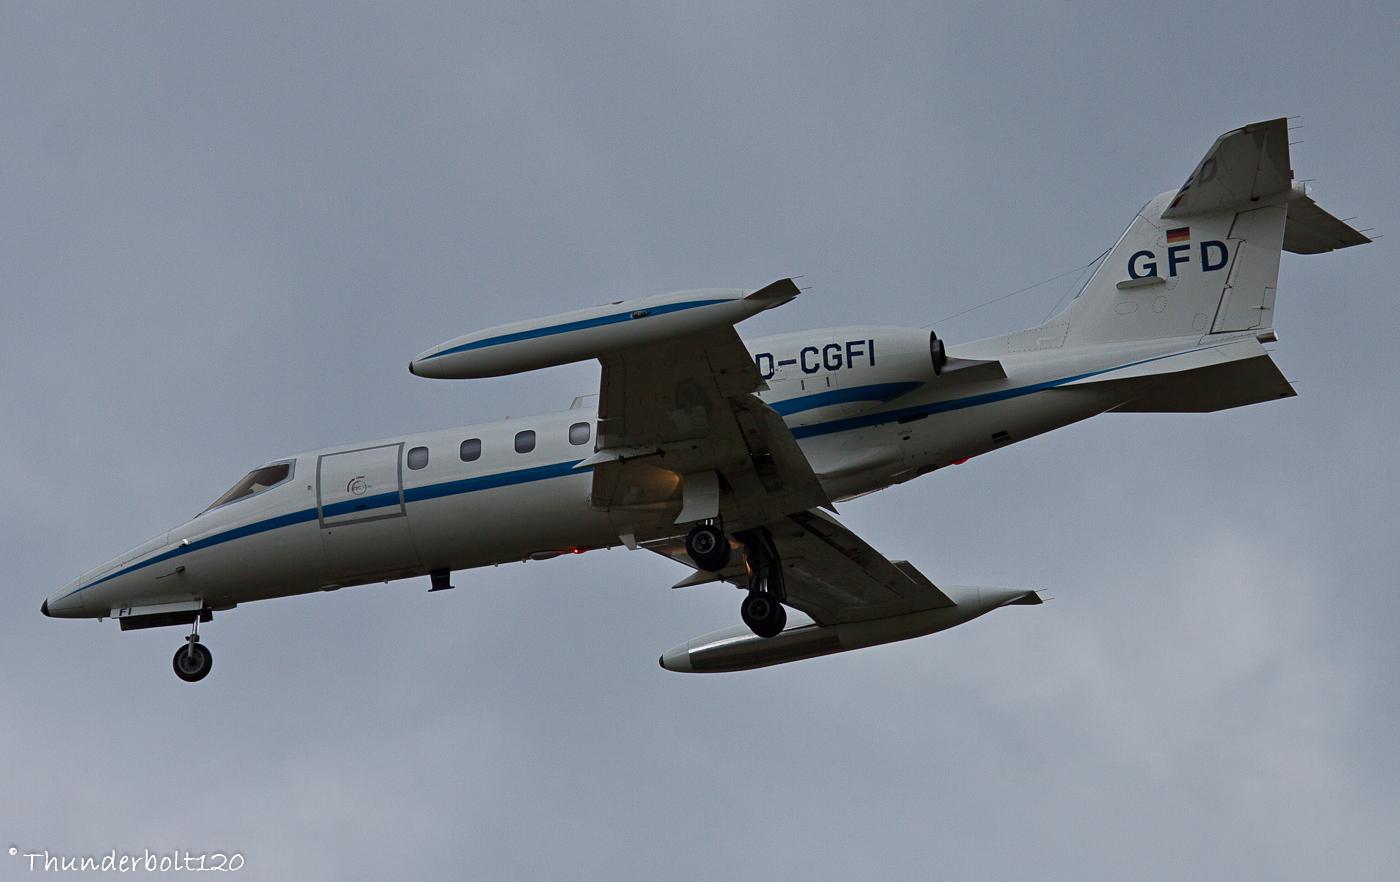 Learjet 35A D-CGFI